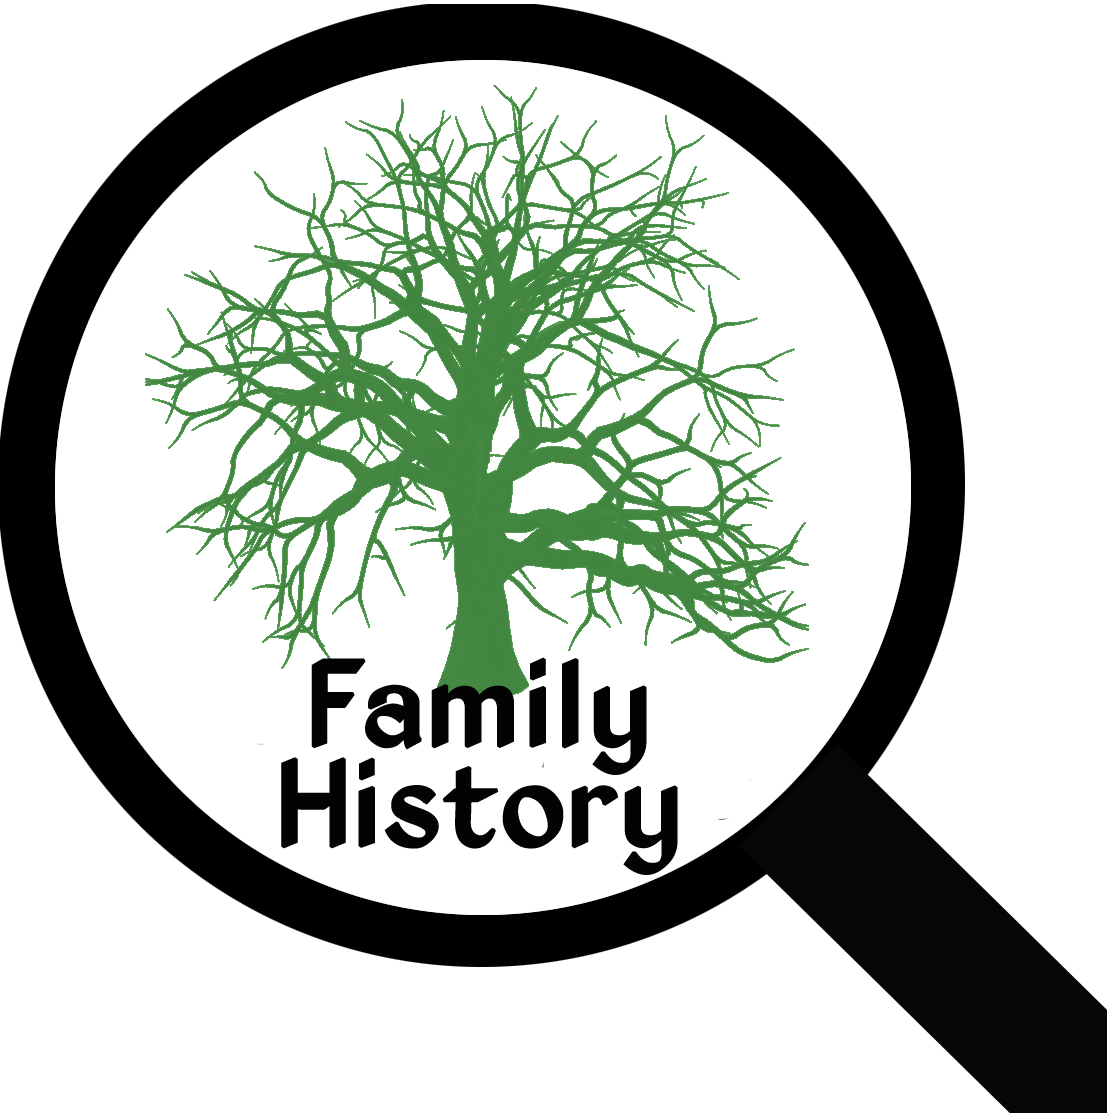 g-fh-TreeGenealogy.png